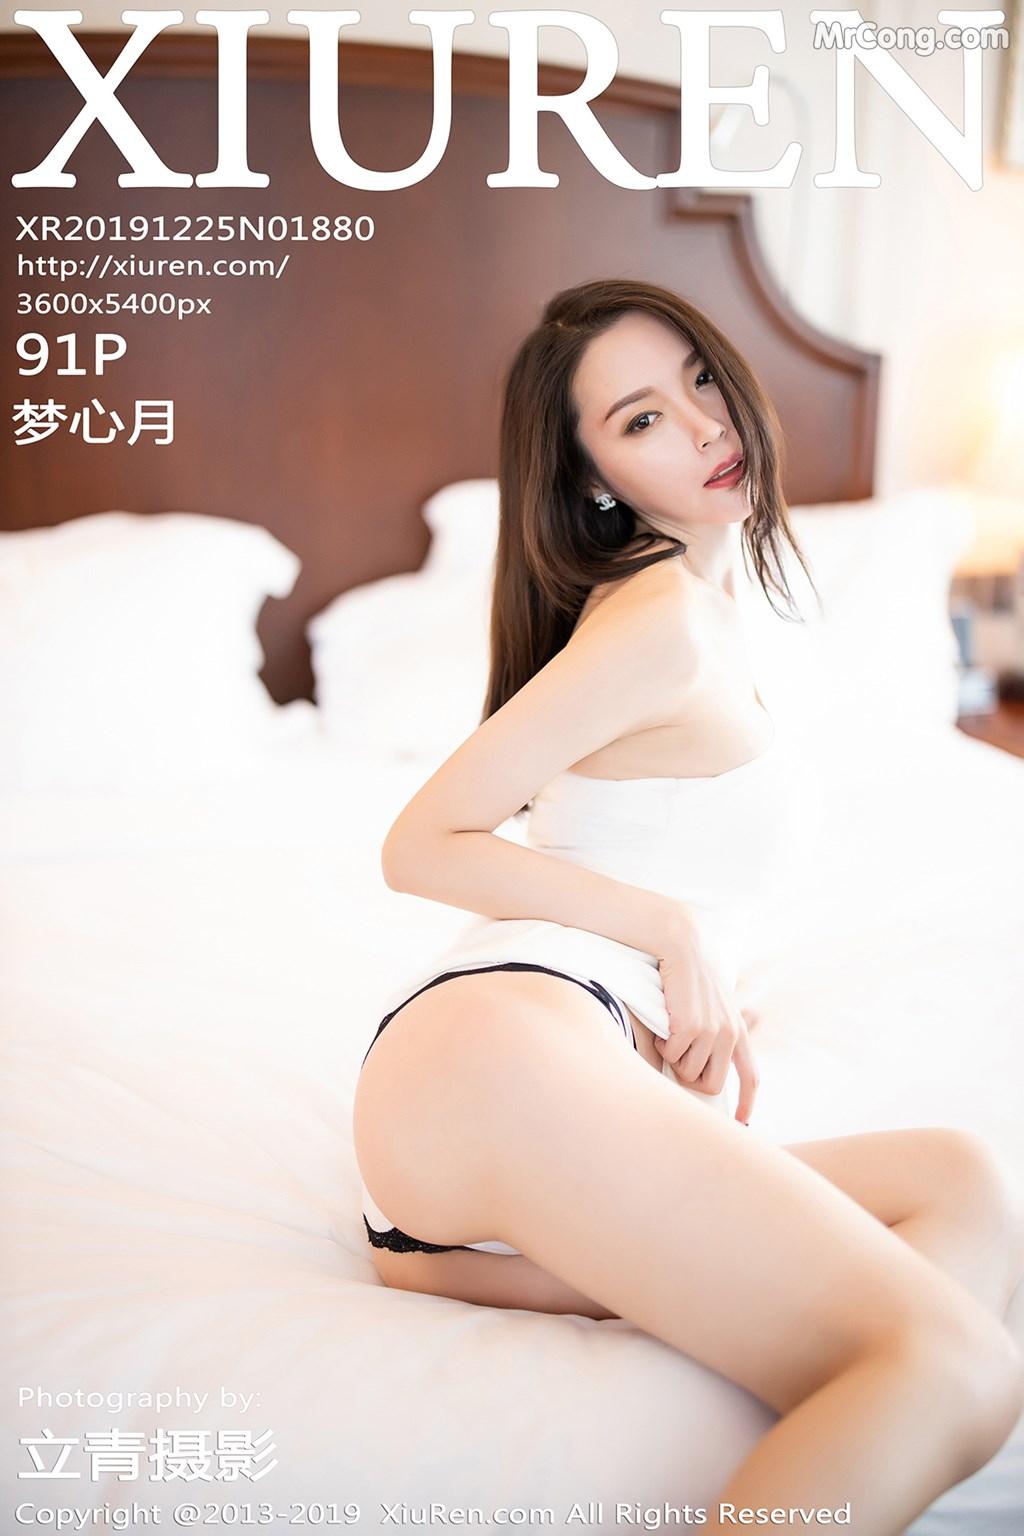 XIUREN No.1880: Meng Xin Yue (梦 心 月) (92 pictures)